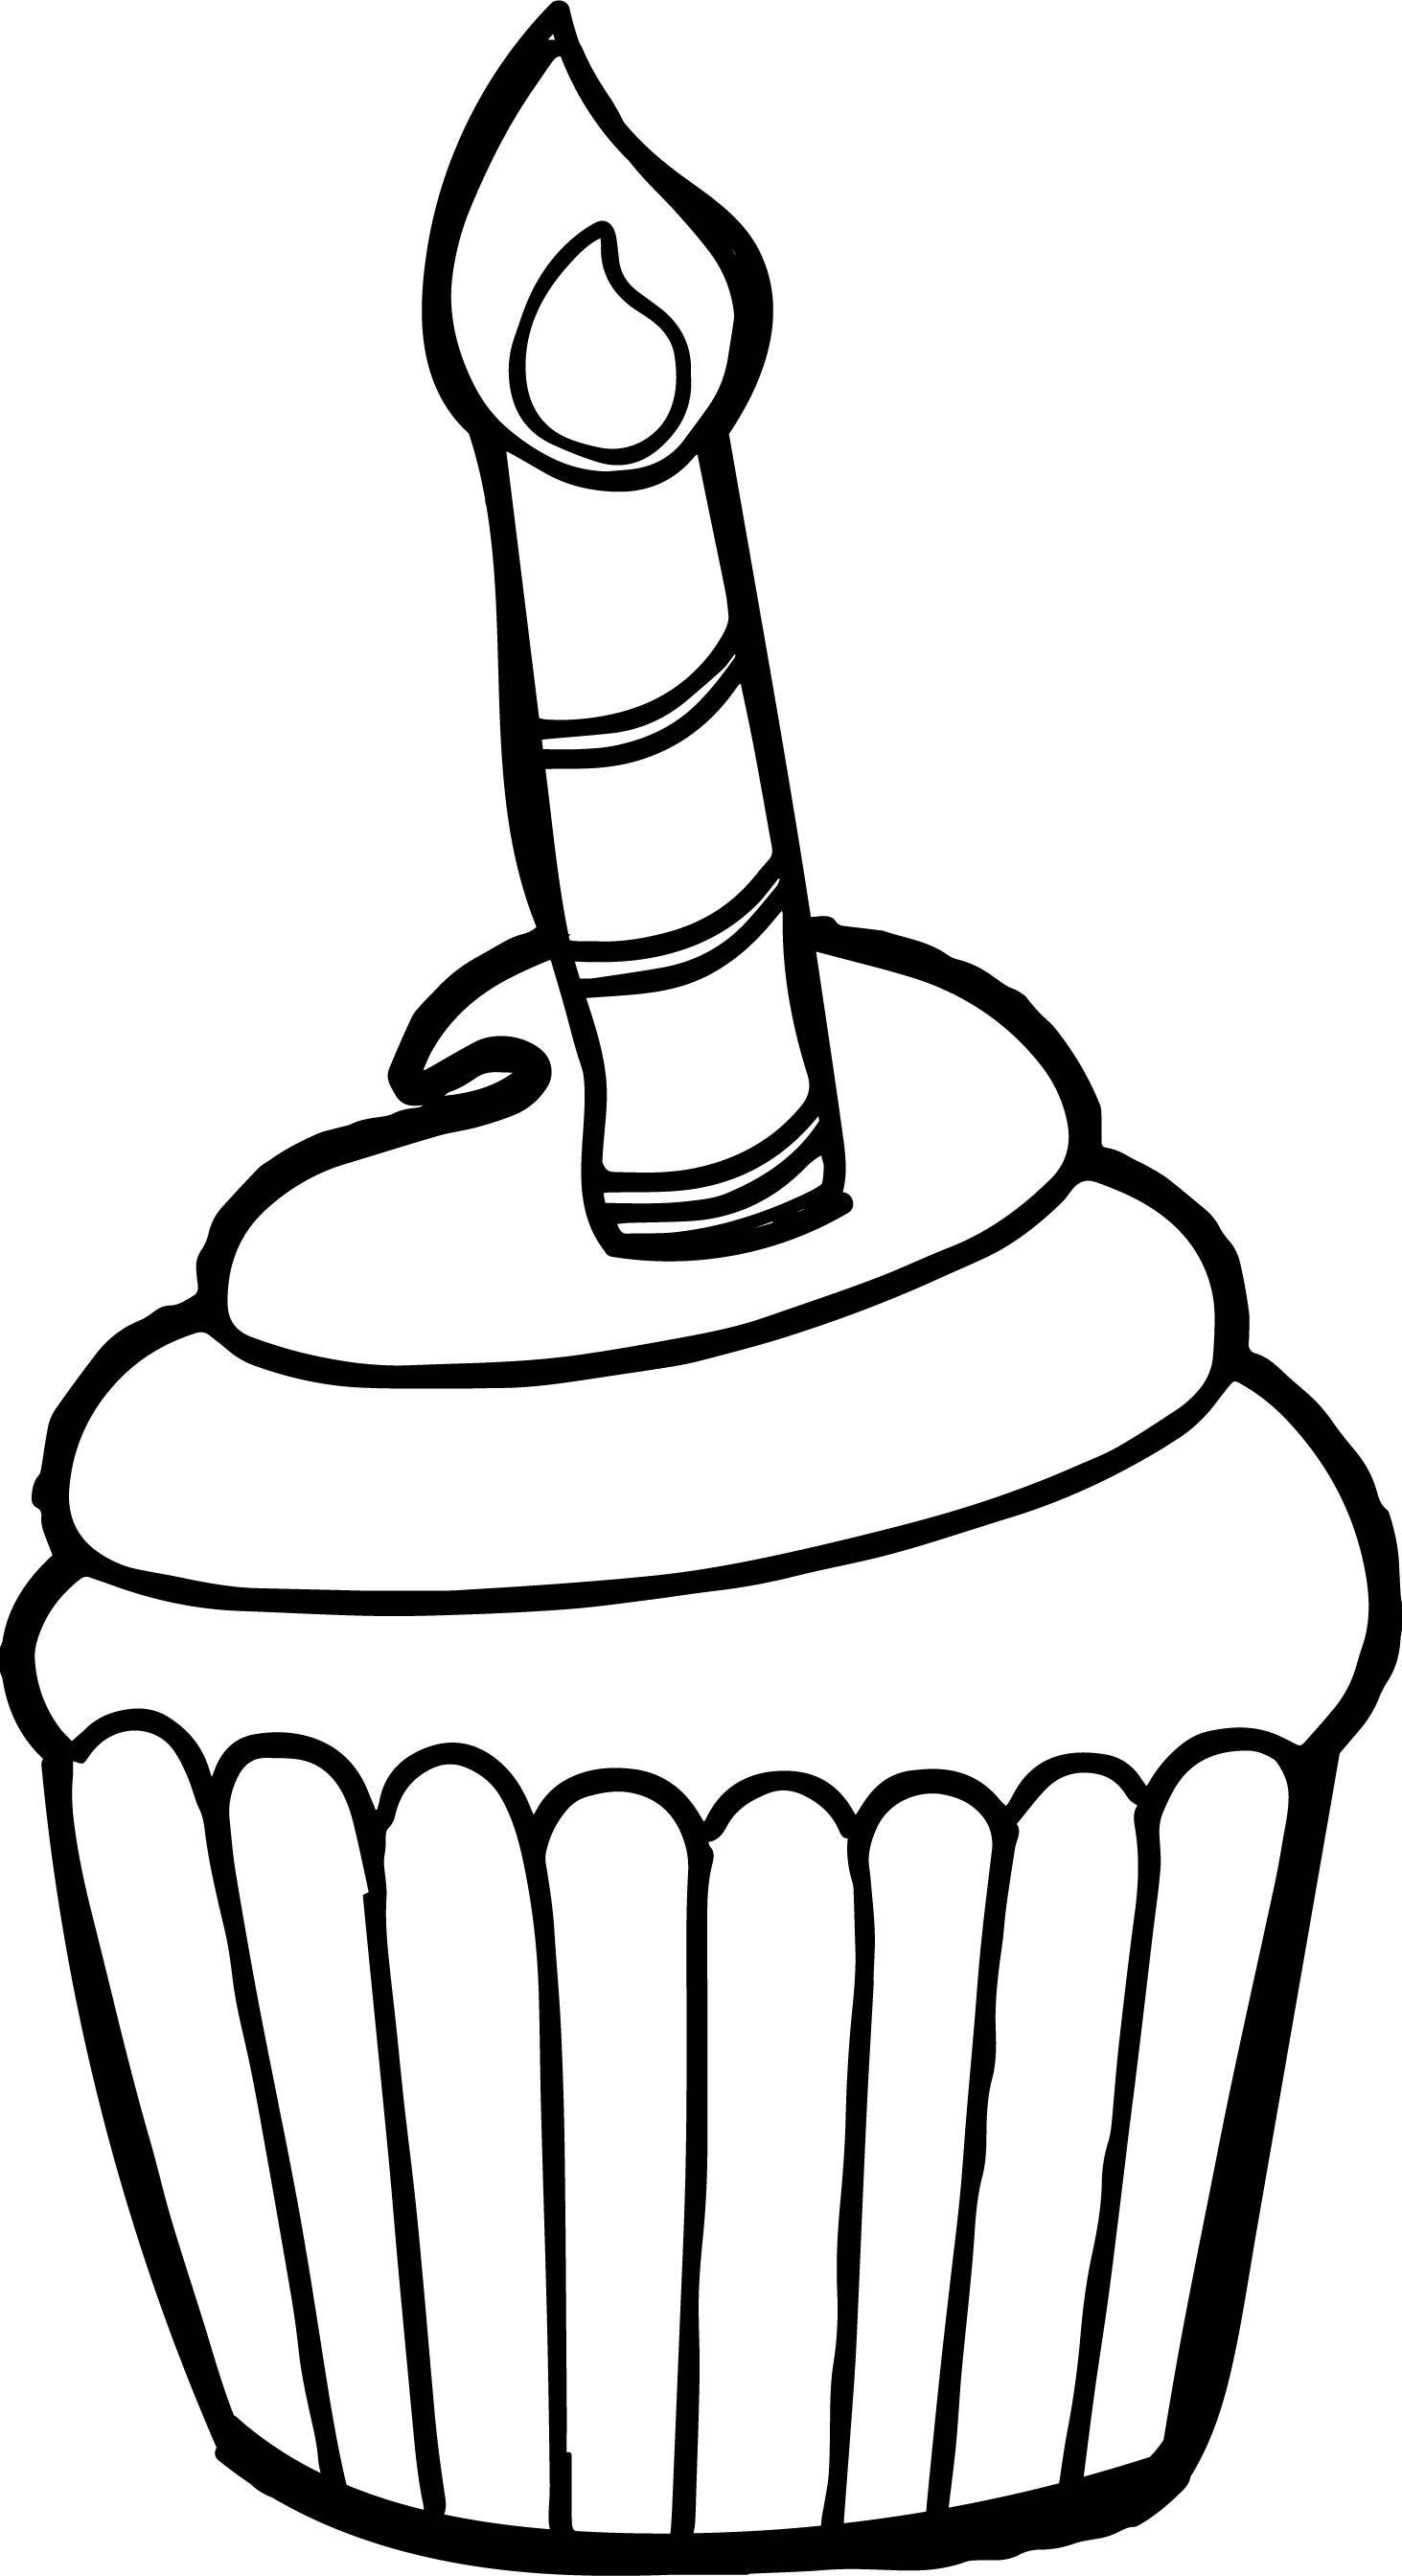 38++ Printable cupcake coloring sheets info